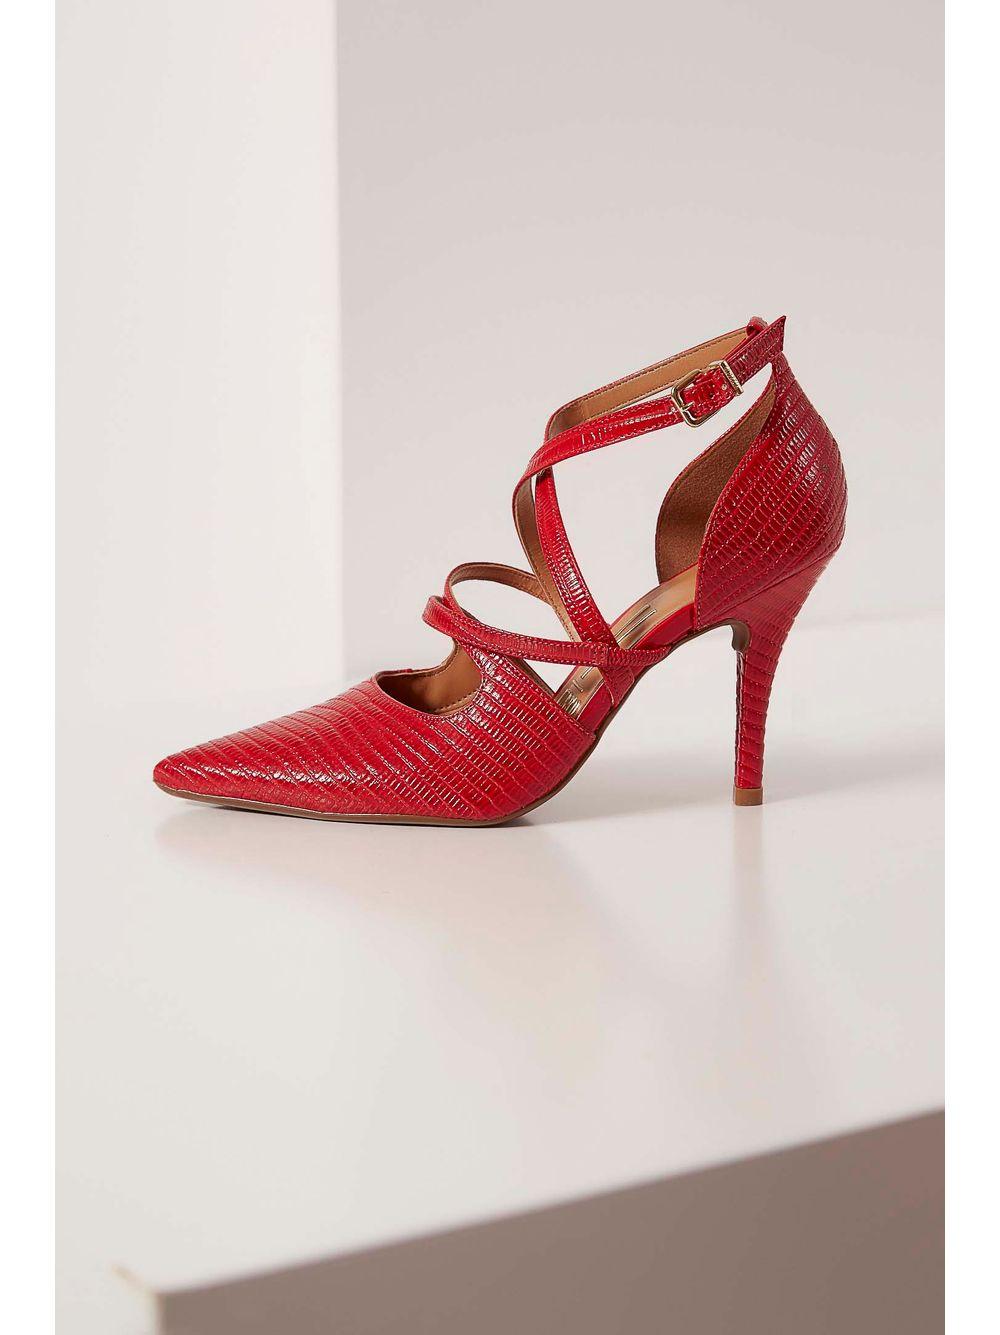 c1bf872e23 Sapato Scarpin Vizzano Verniz Fivela Vermelho - pittol